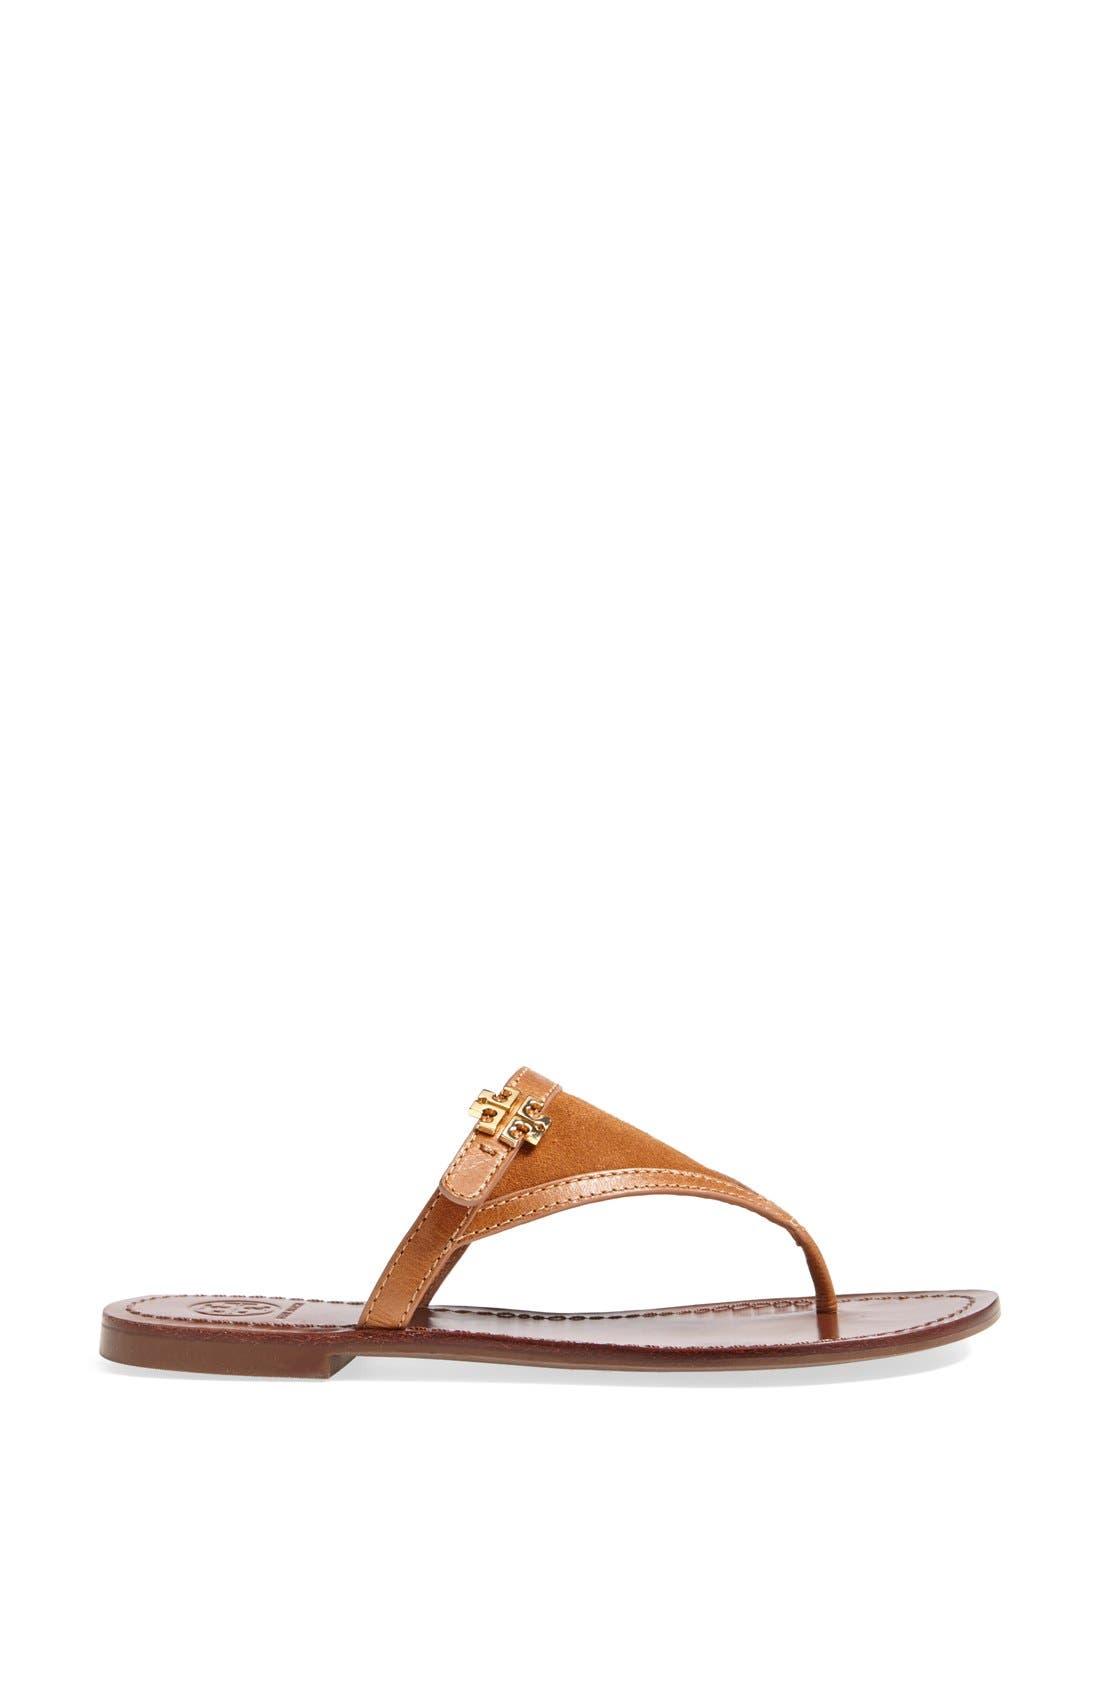 Alternate Image 4  - Tory Burch 'Eloise' Flat Thong Sandal (Nordstrom Exclusive) (Women)